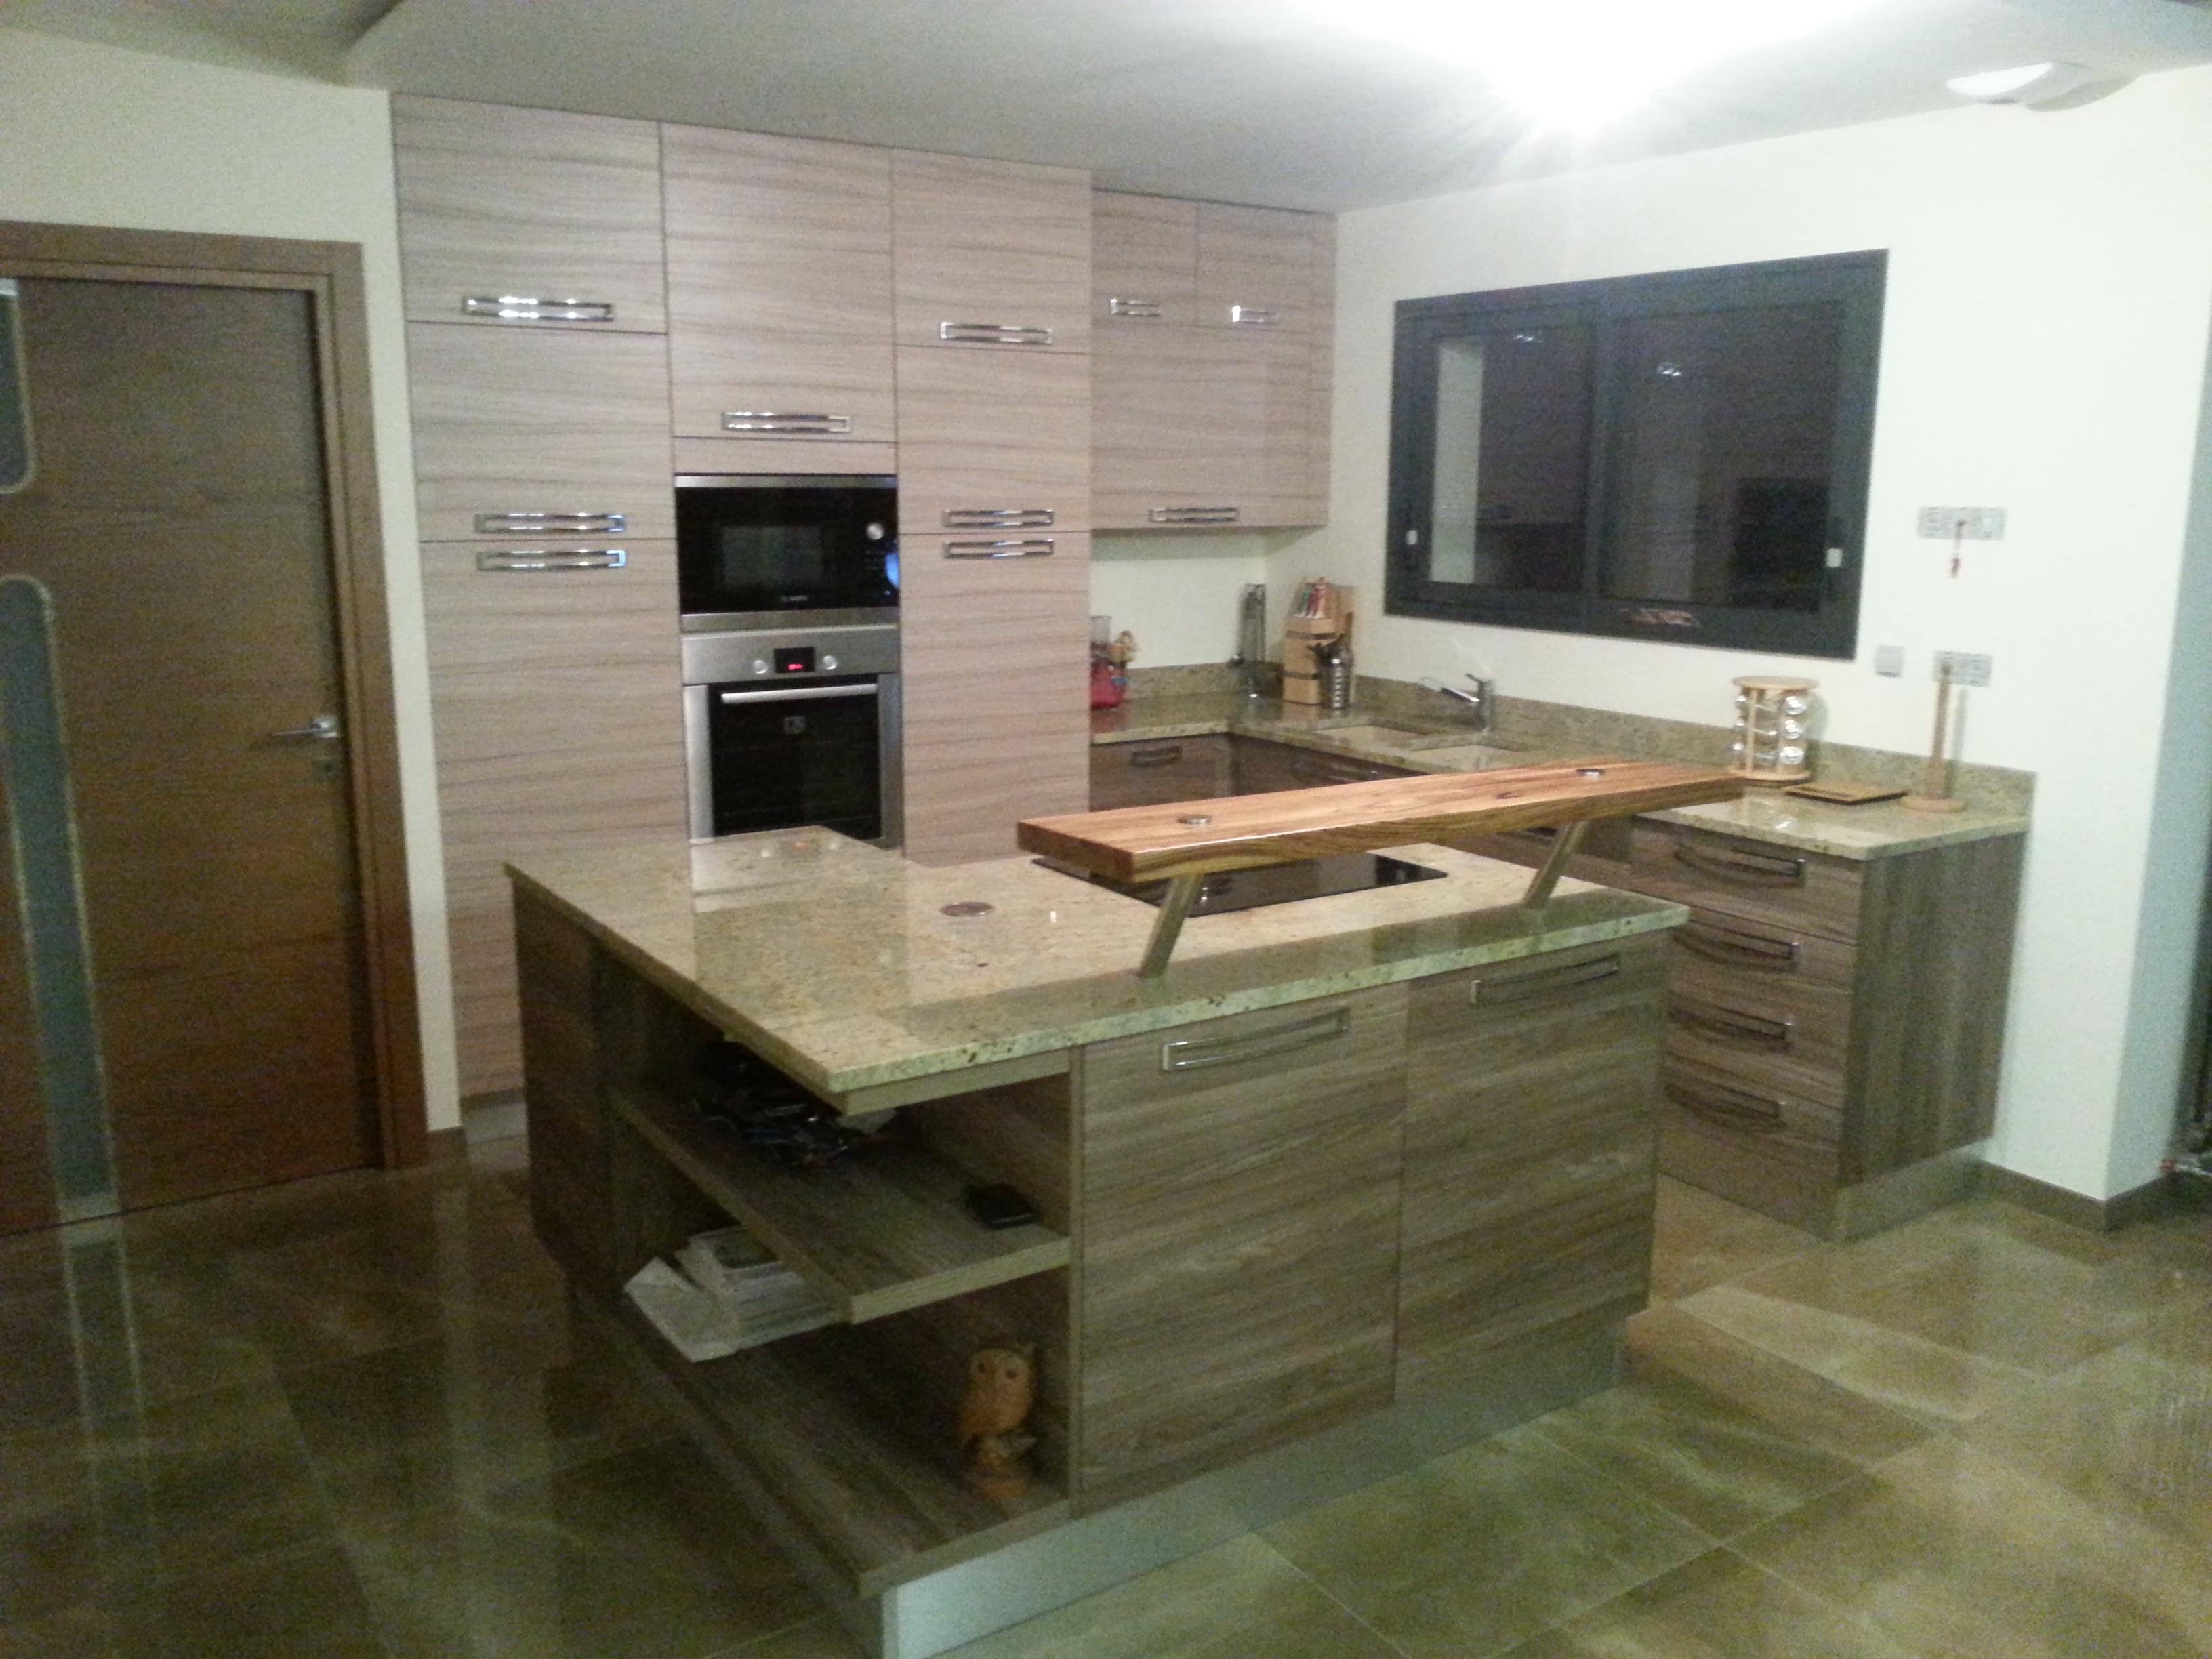 cuisine classique a pibrac pose cuisines cuisines 31. Black Bedroom Furniture Sets. Home Design Ideas